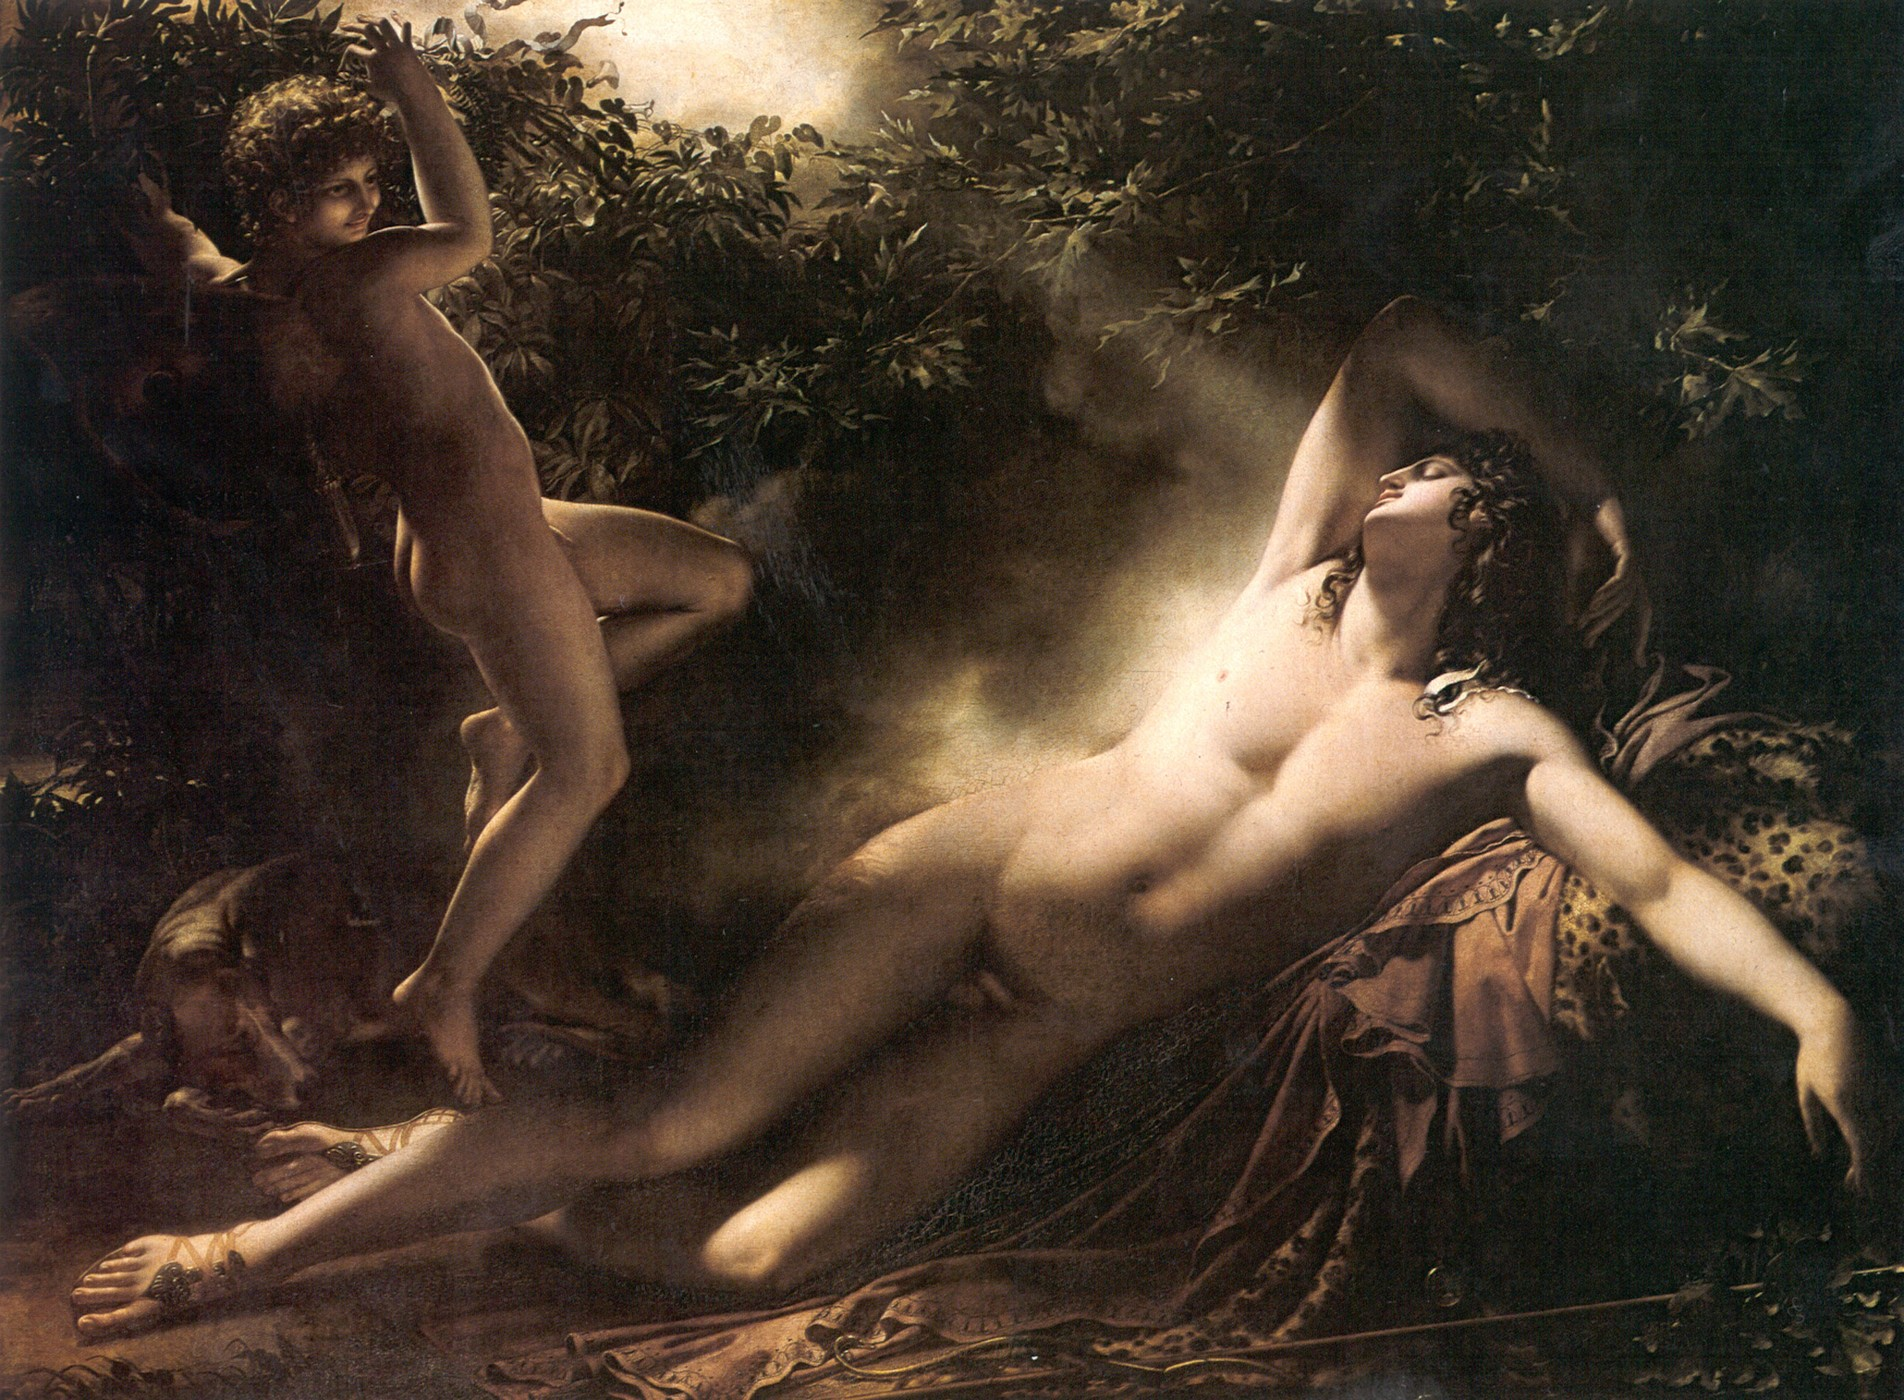 Figura 10 - Anne-Louis Girodet. O sono de Endimião